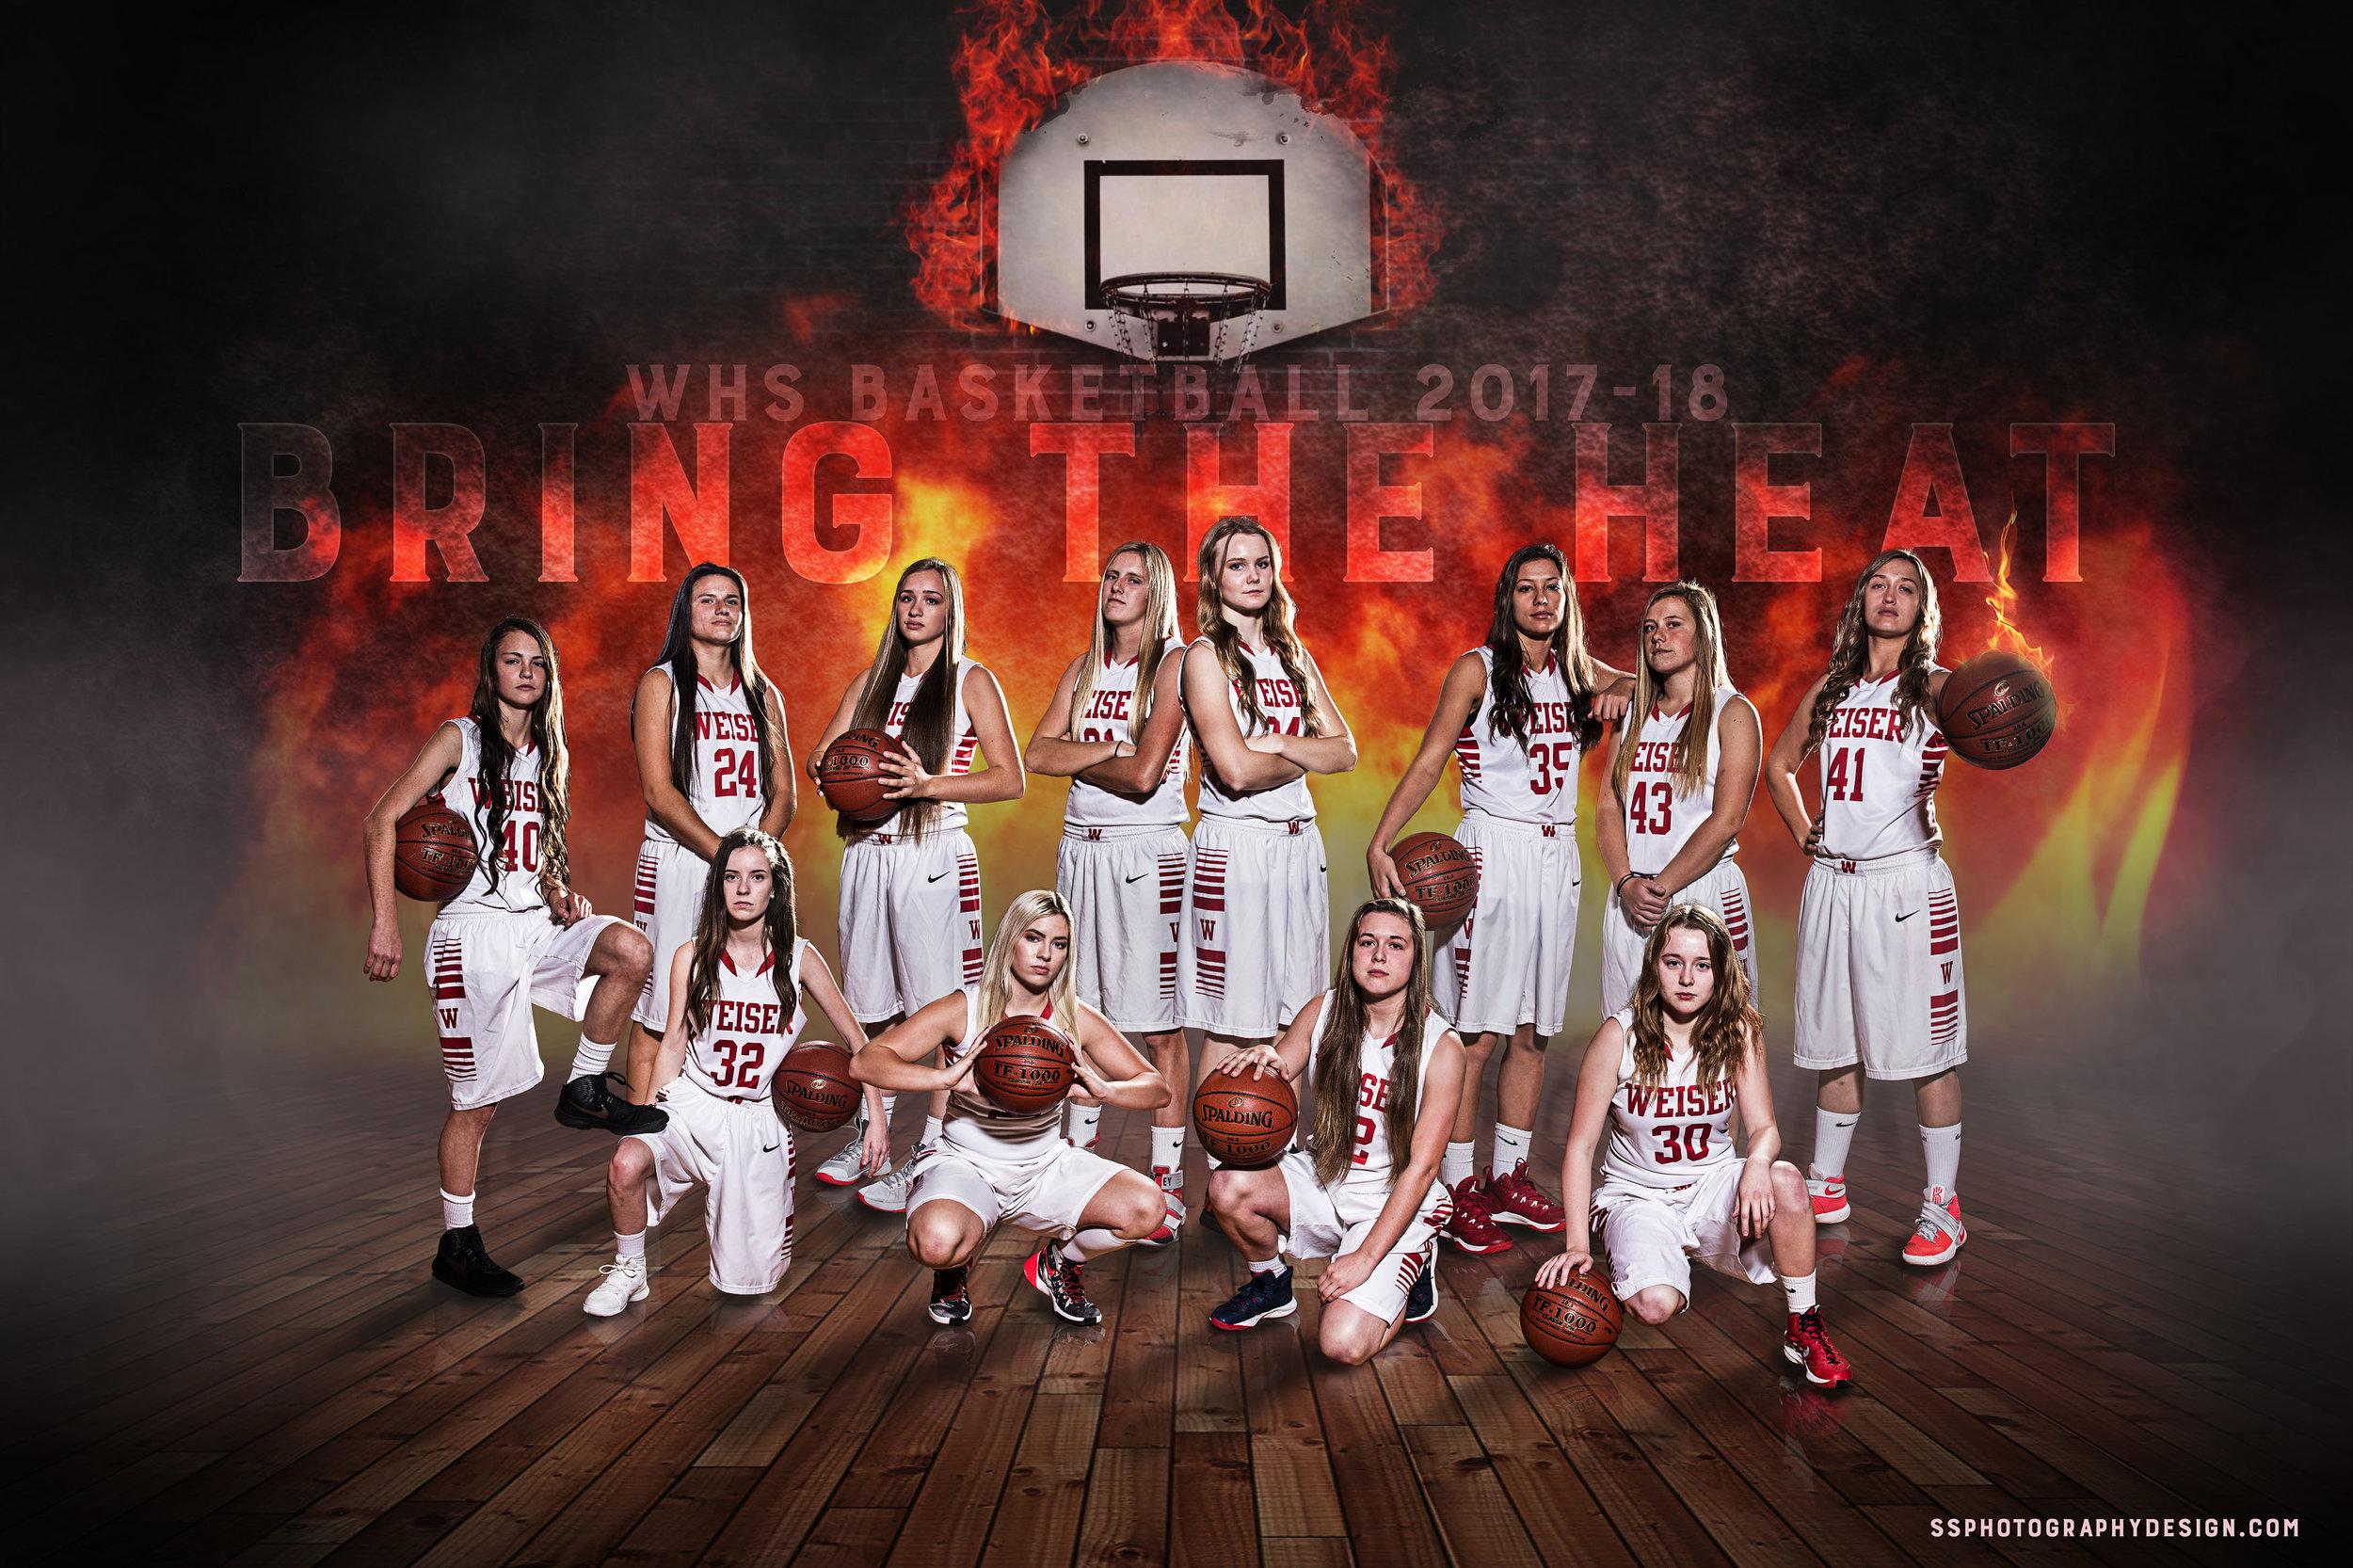 WHS Girls Basketball Team photography, lighting, and composite.